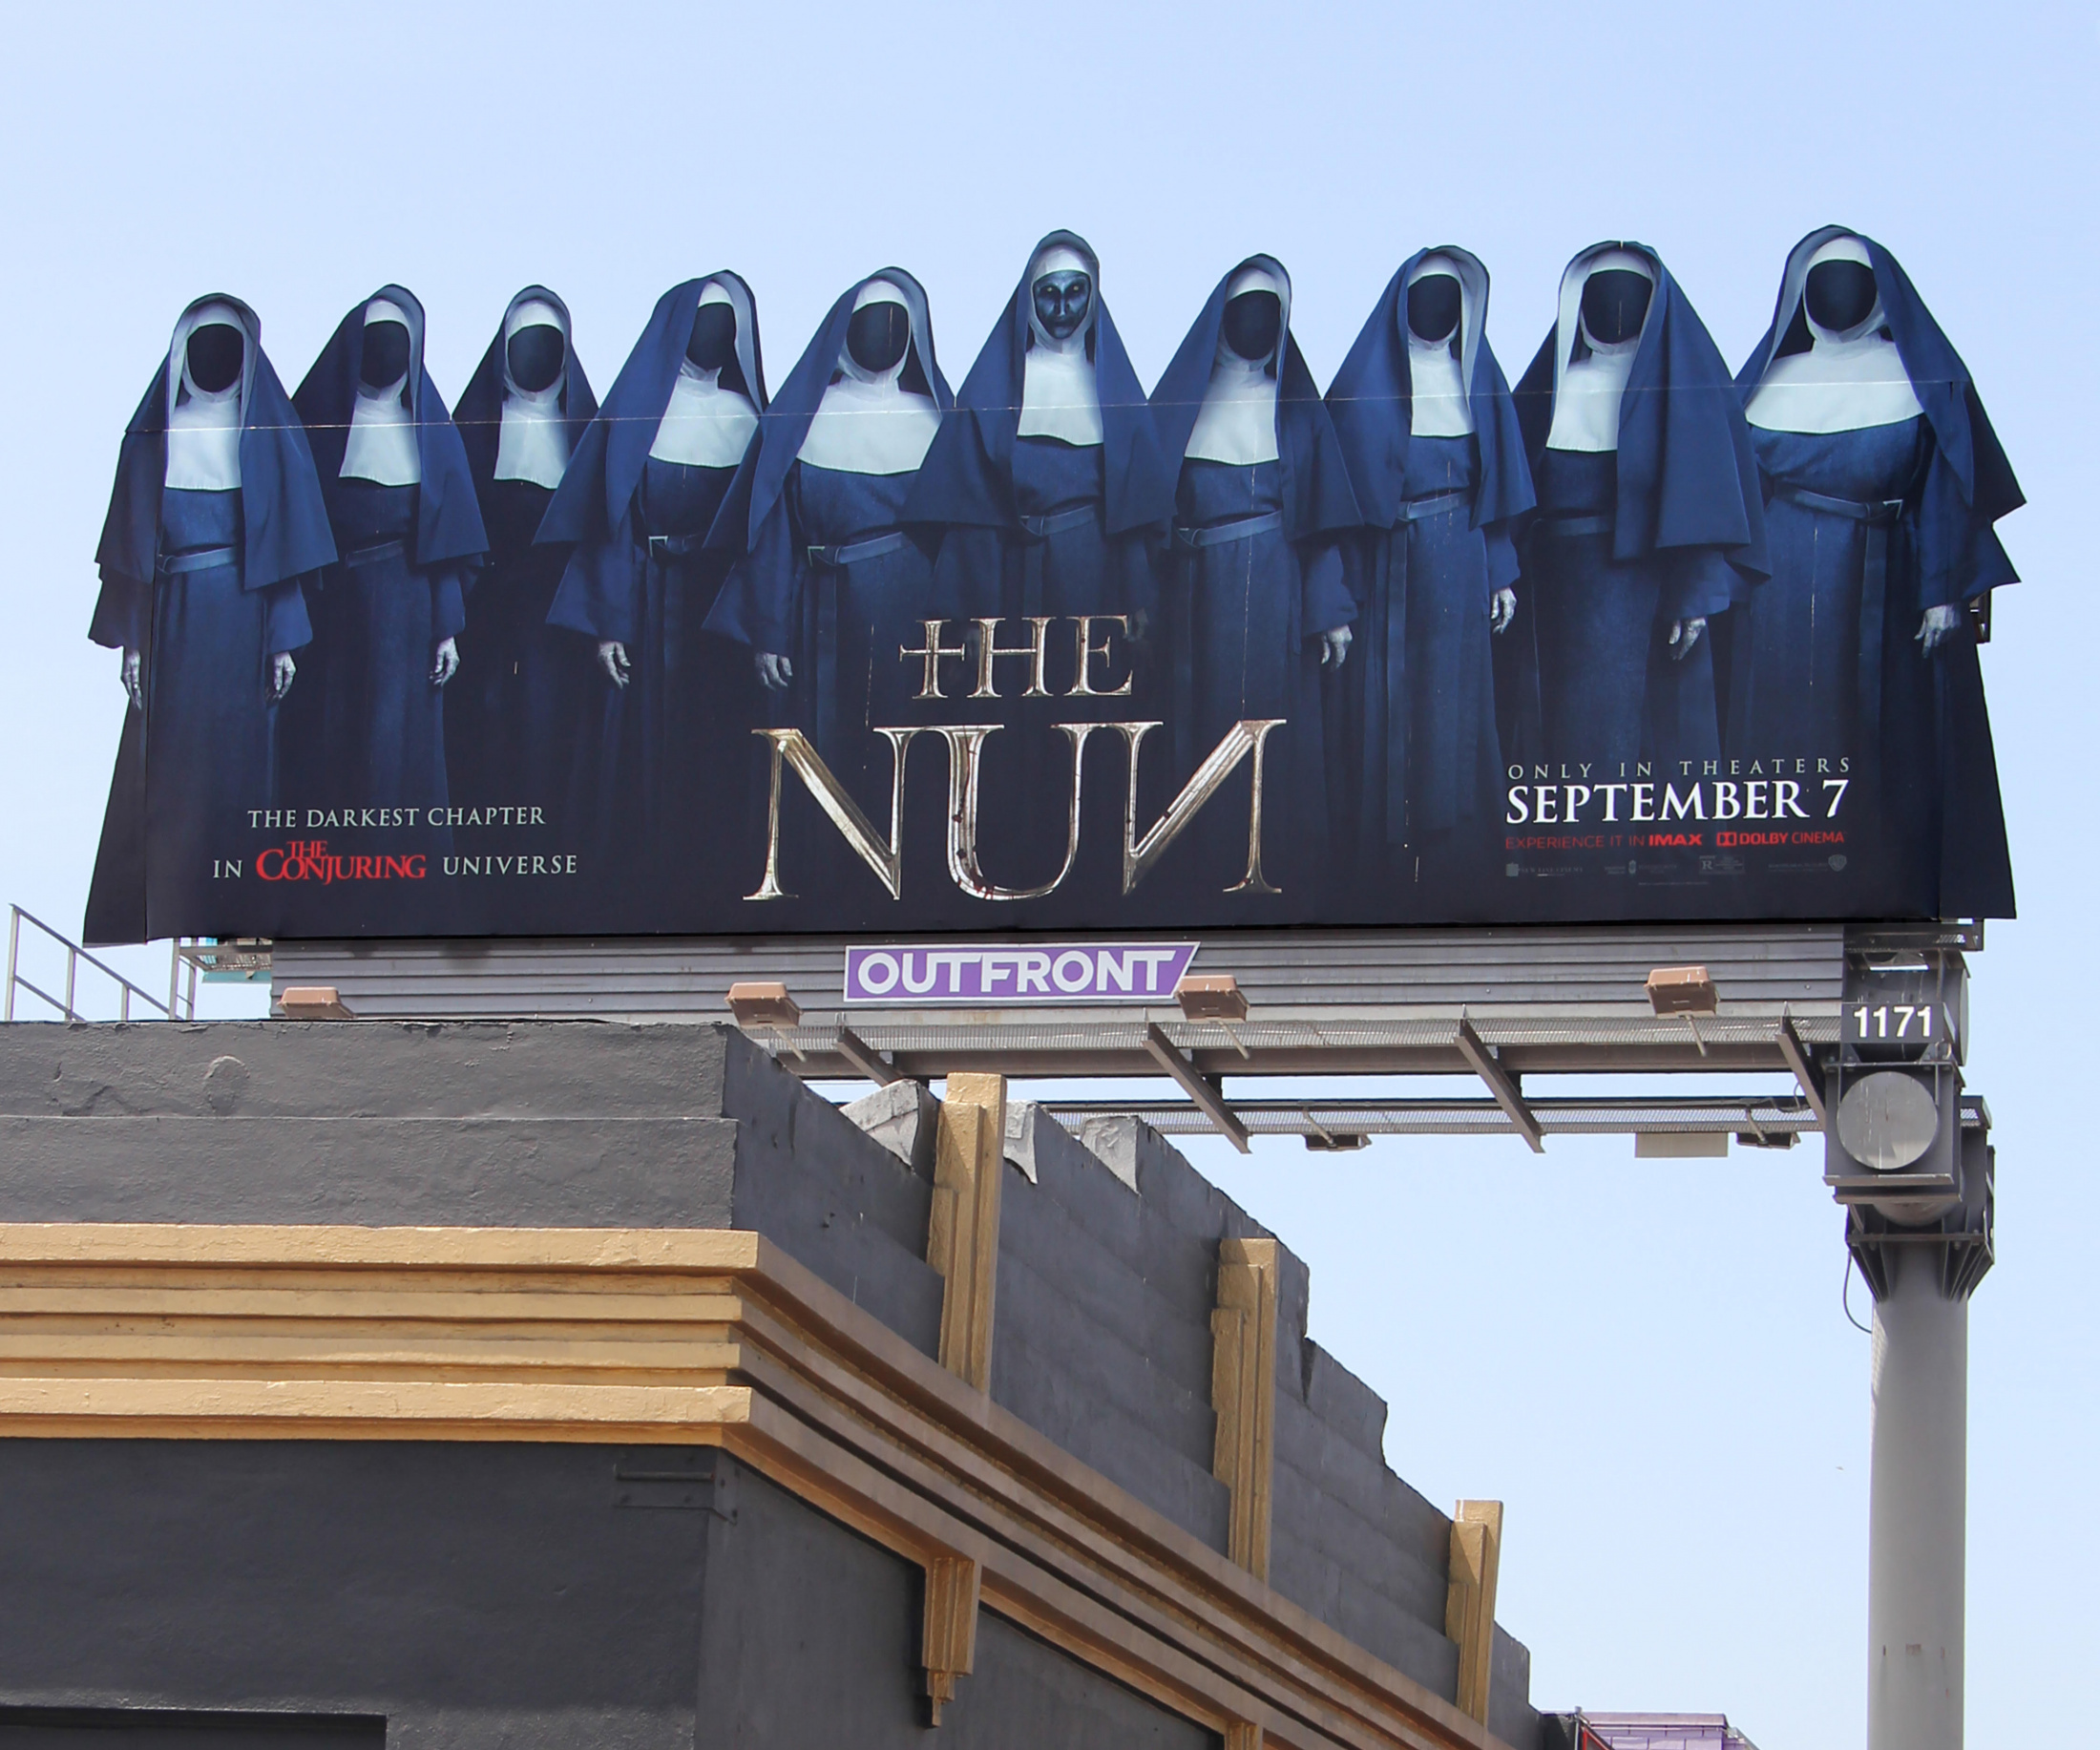 Thumbnail for The Nuns